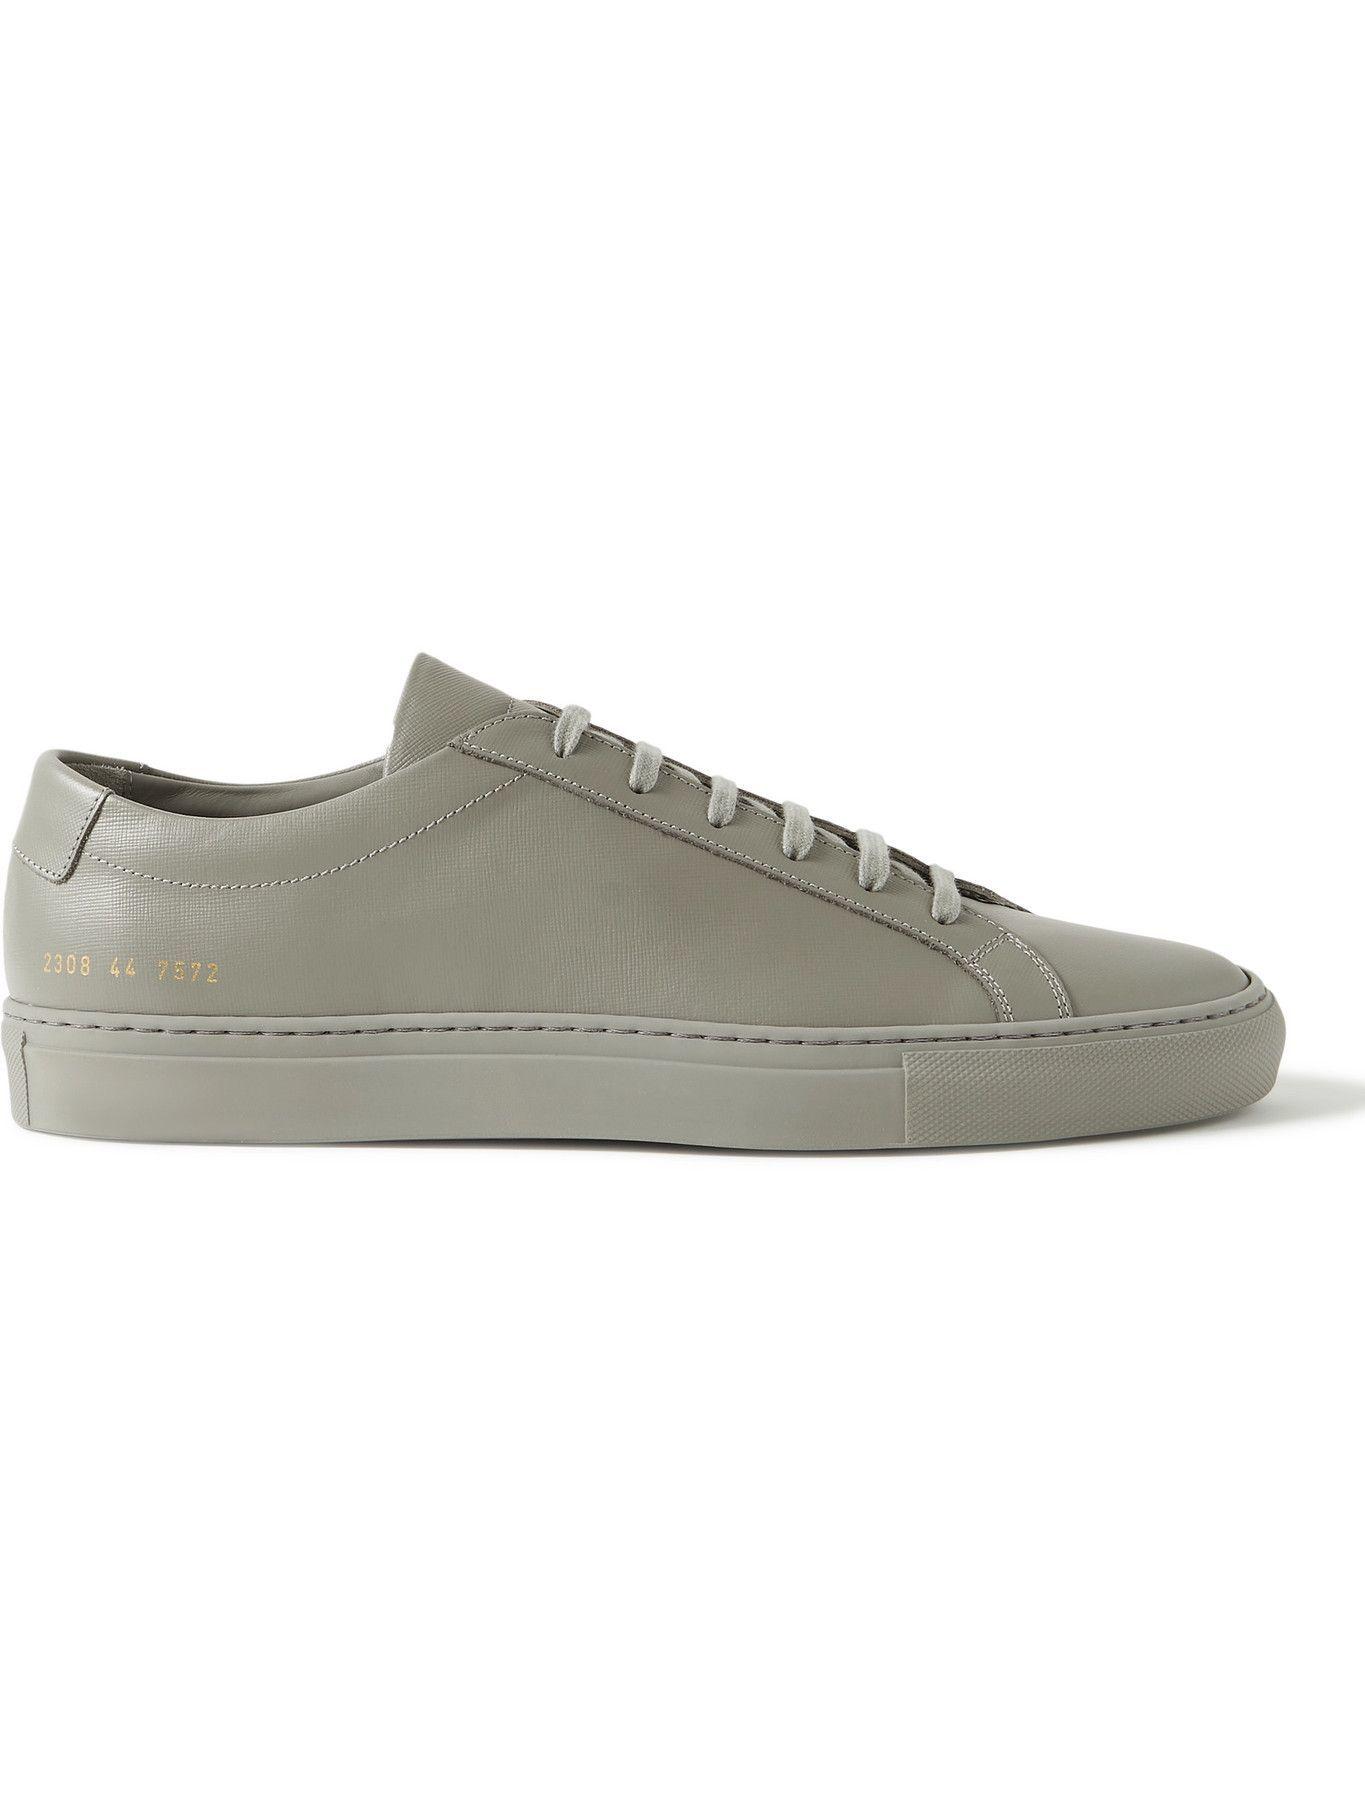 Photo: Common Projects - Original Achilles Saffiano Leather Sneakers - Gray